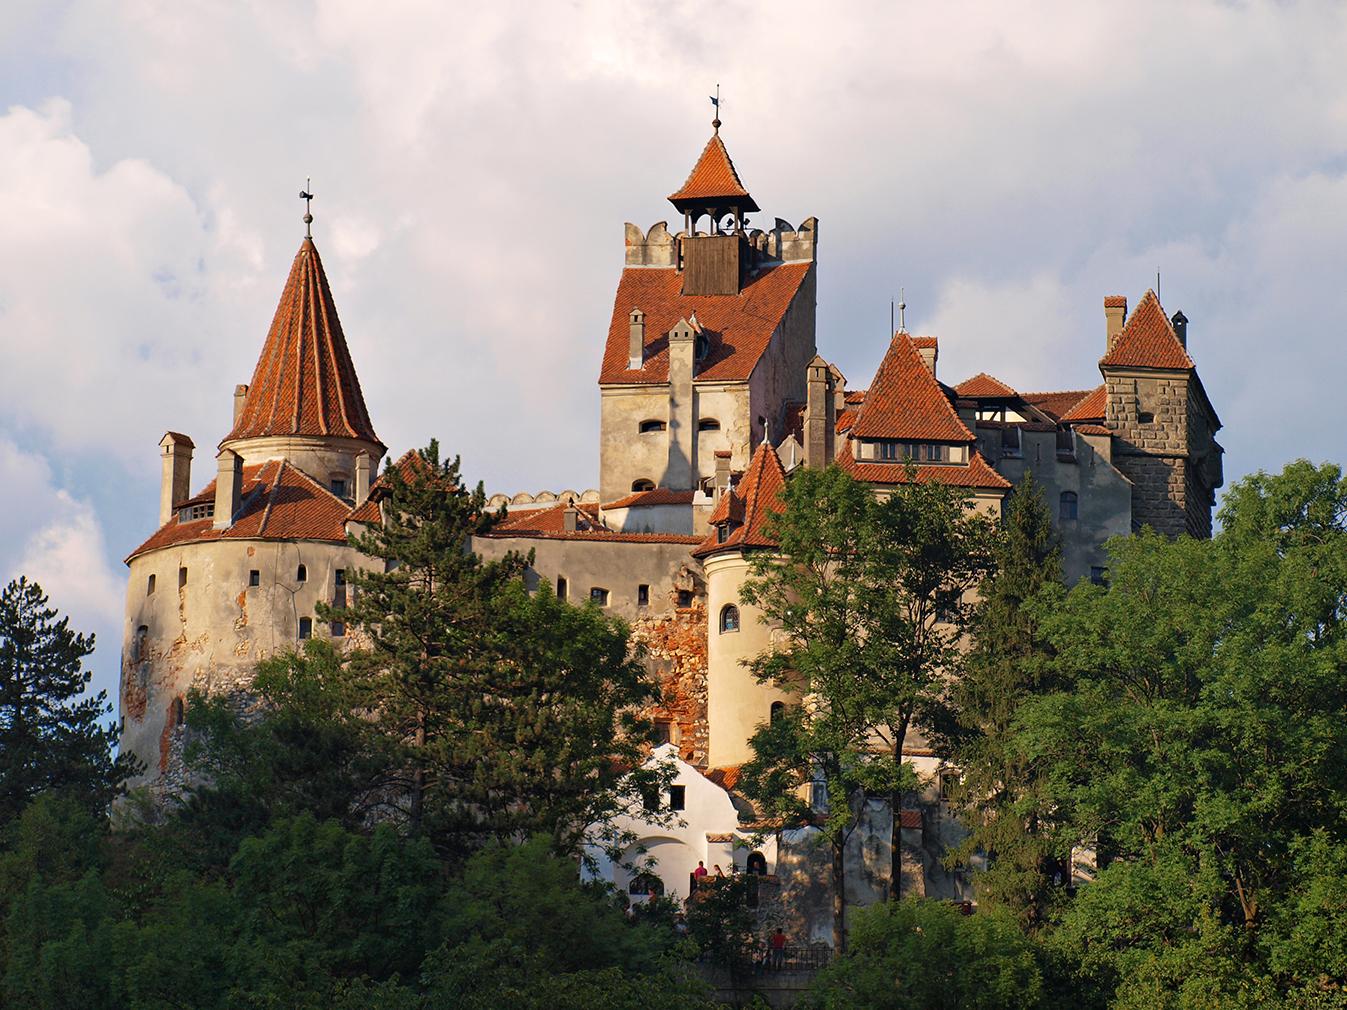 Dracula's Castle, Bram Stoker Inspiration, Romania